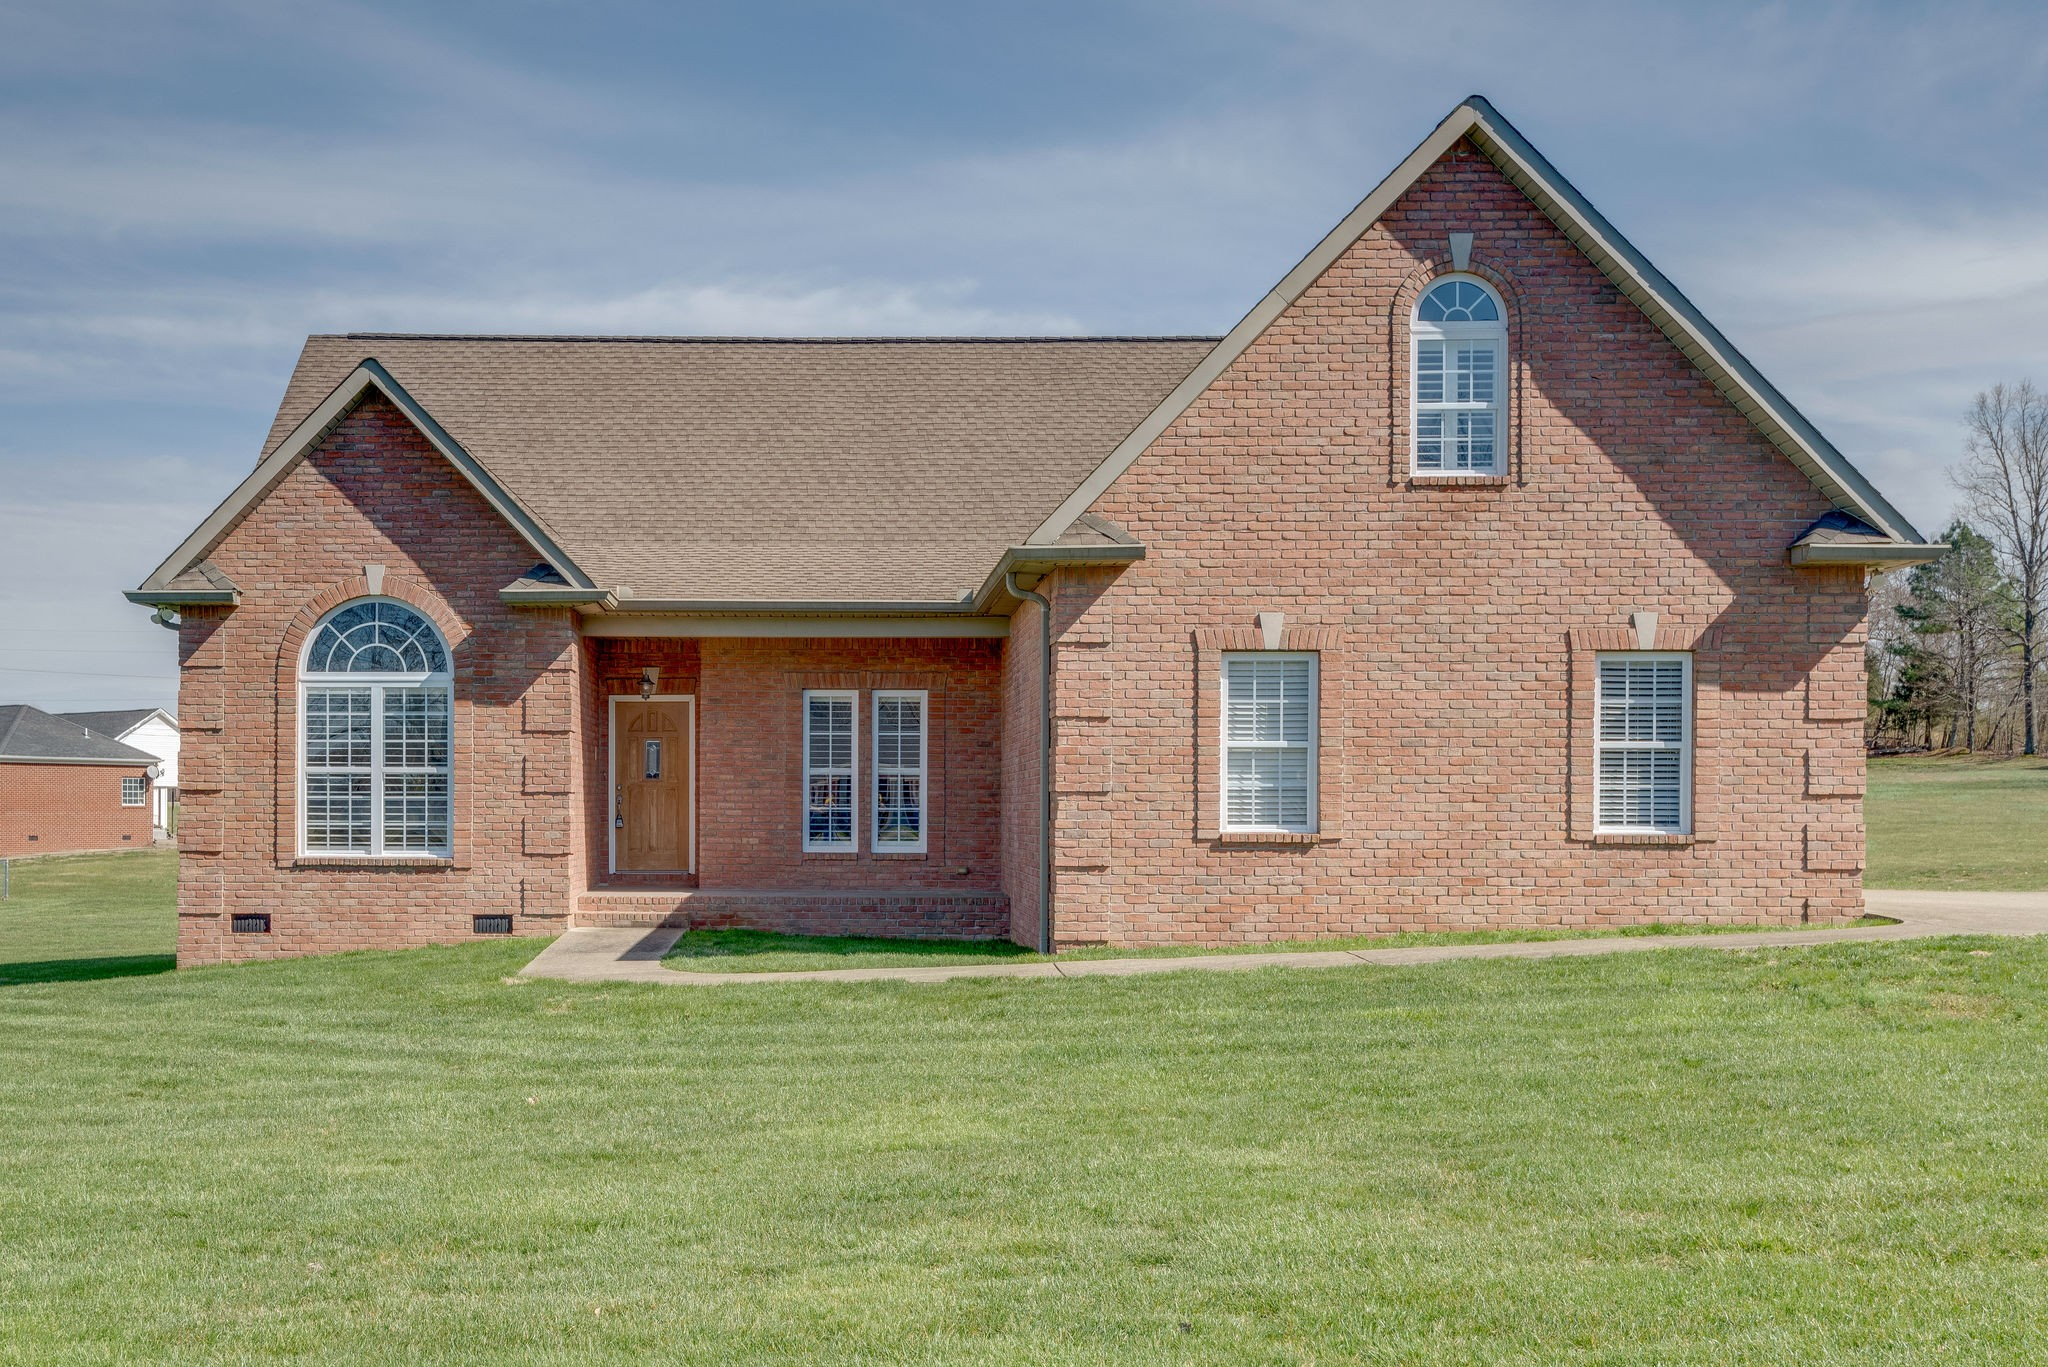 109 Needham Ln, Burns, TN 37029 - Burns, TN real estate listing